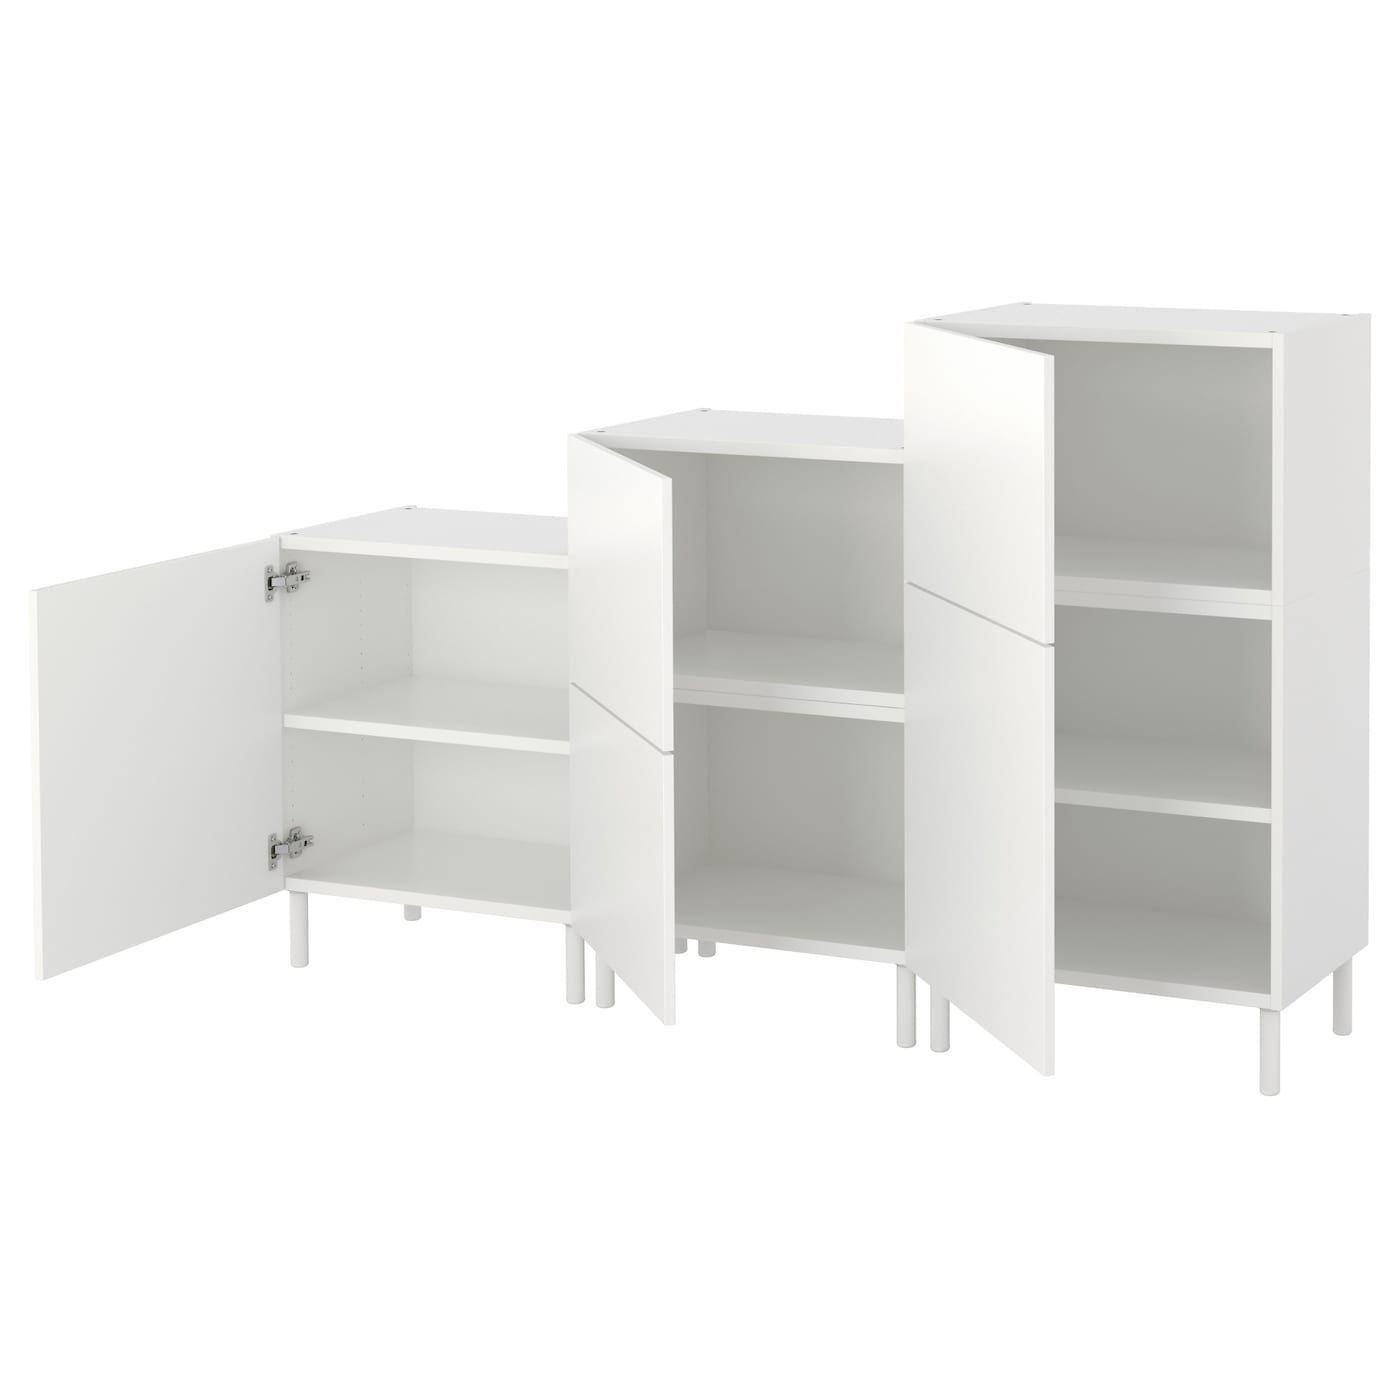 Ikea Meuble De Rangement En 2020 Meuble Rangement Petit Meuble Rangement Rangement